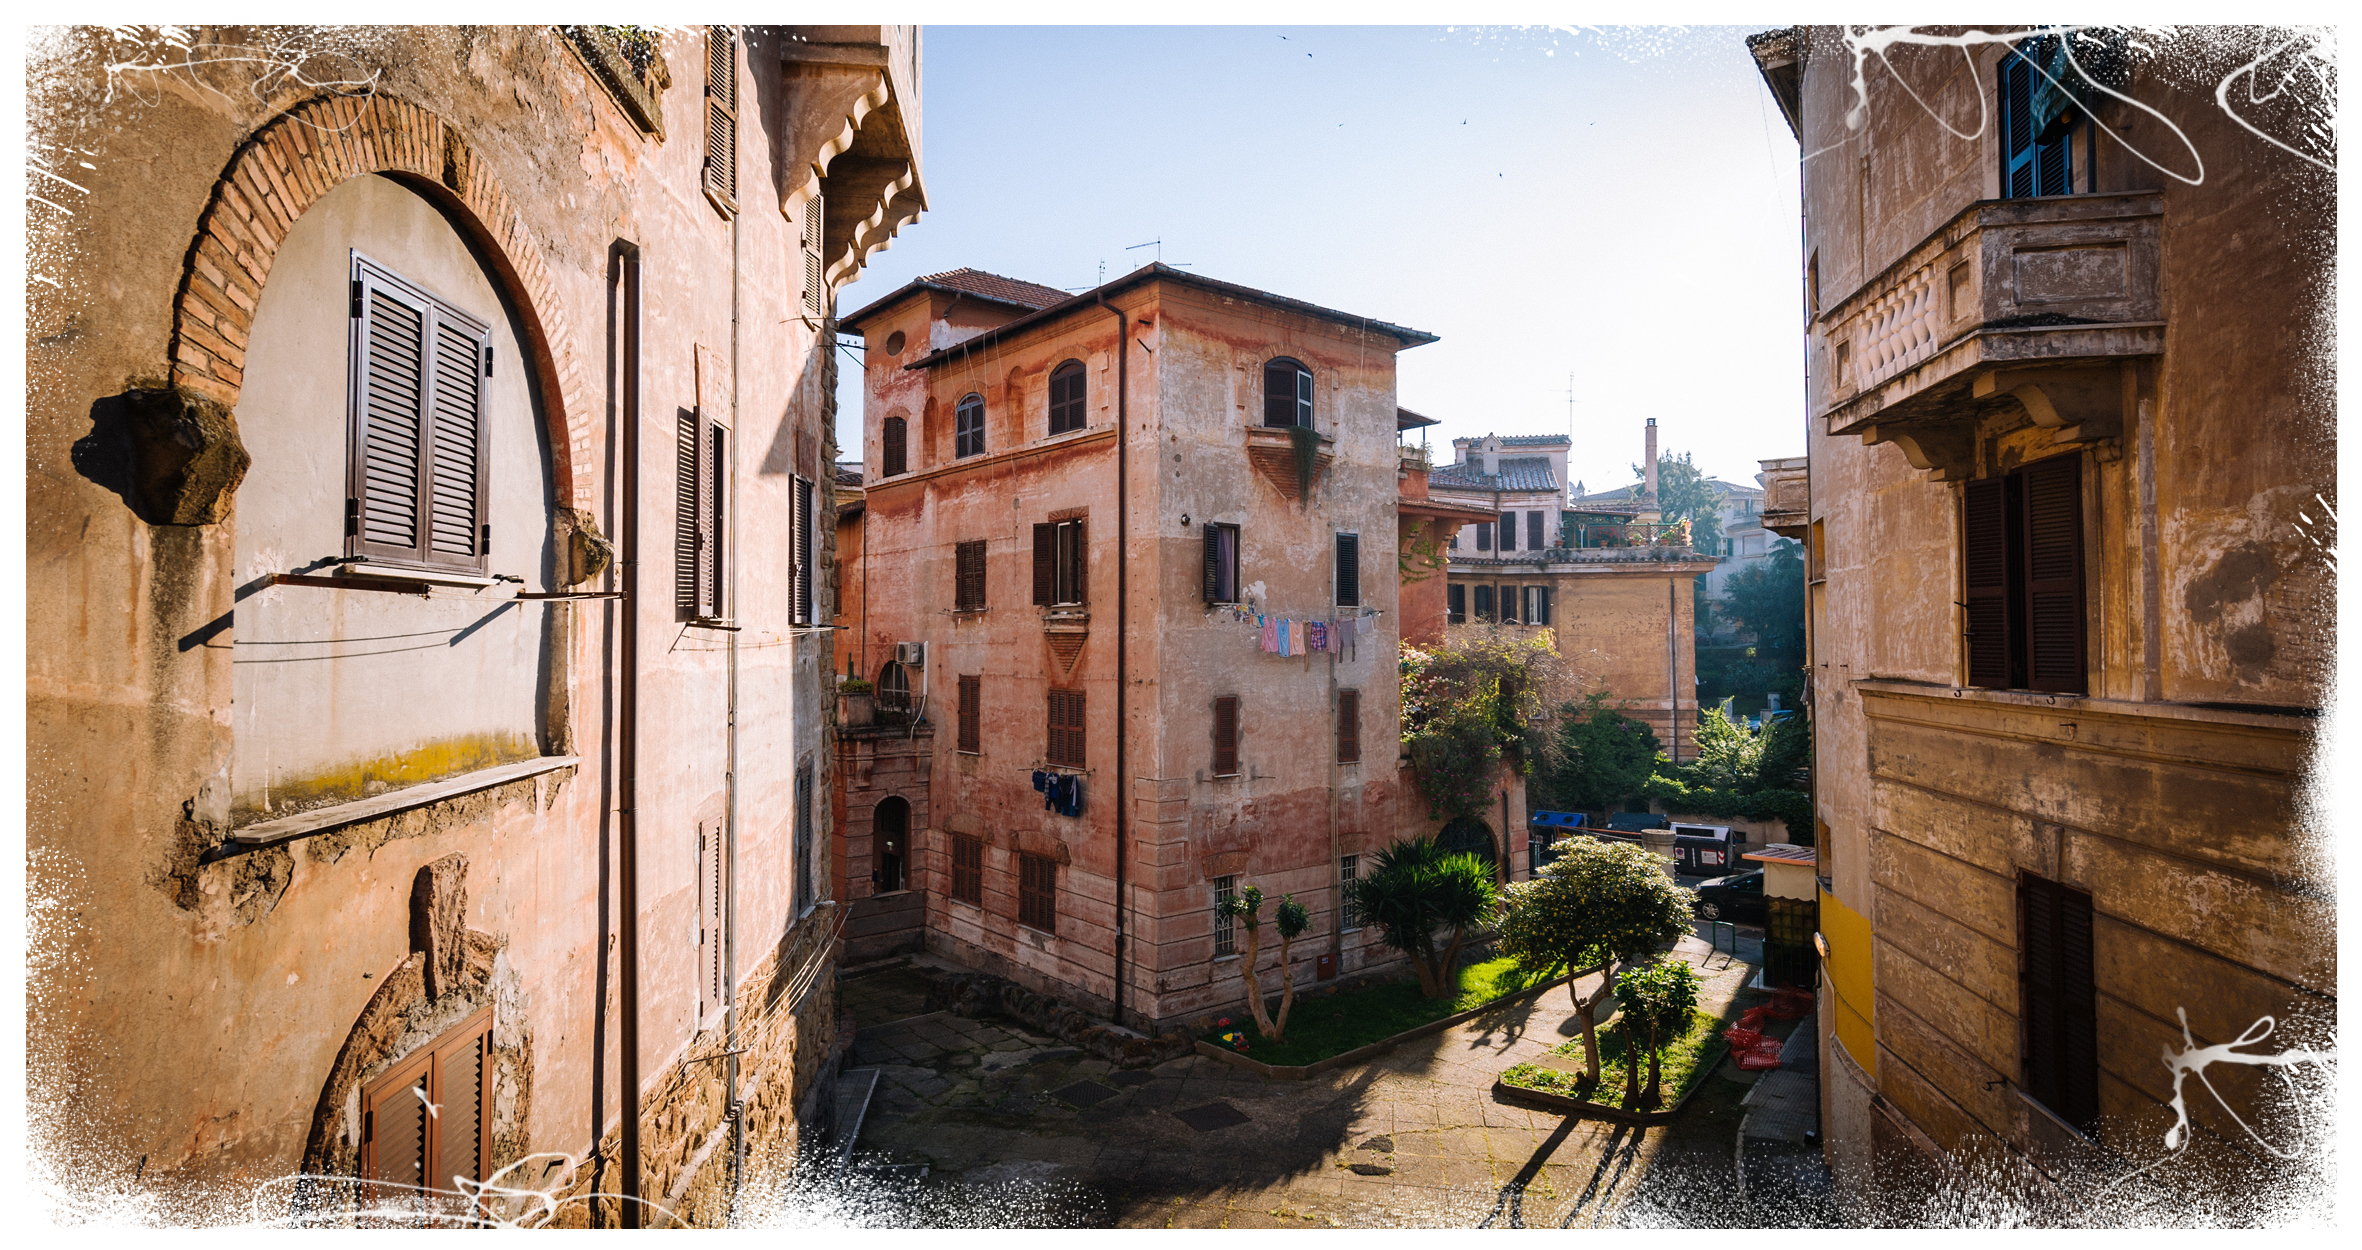 Da Francesco Ristorante - Kontakt